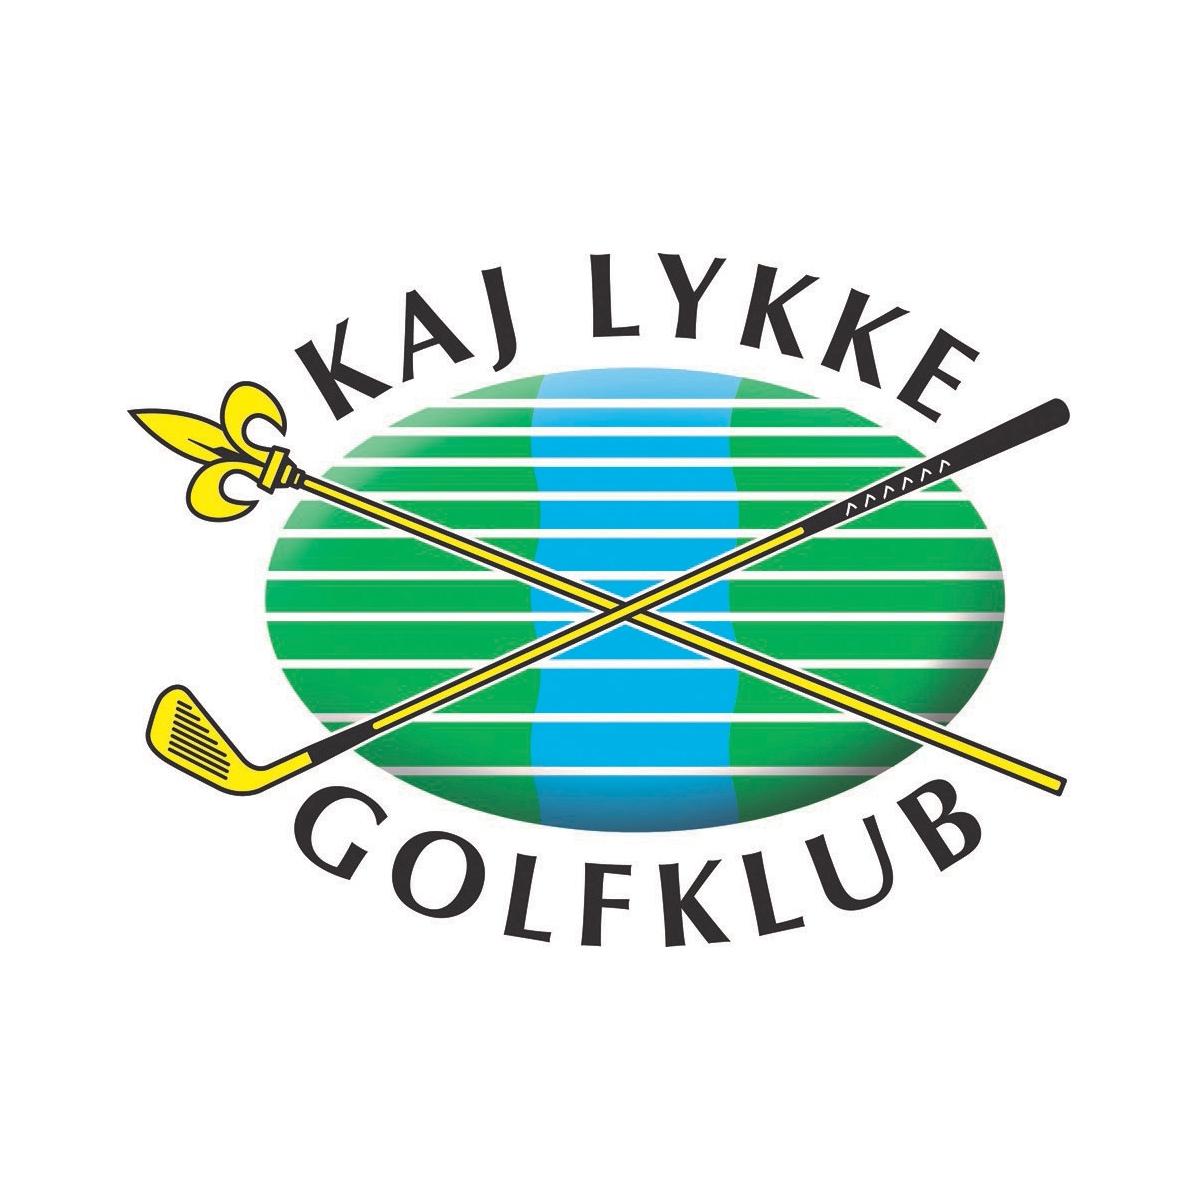 Kaj Lykke Golfklub